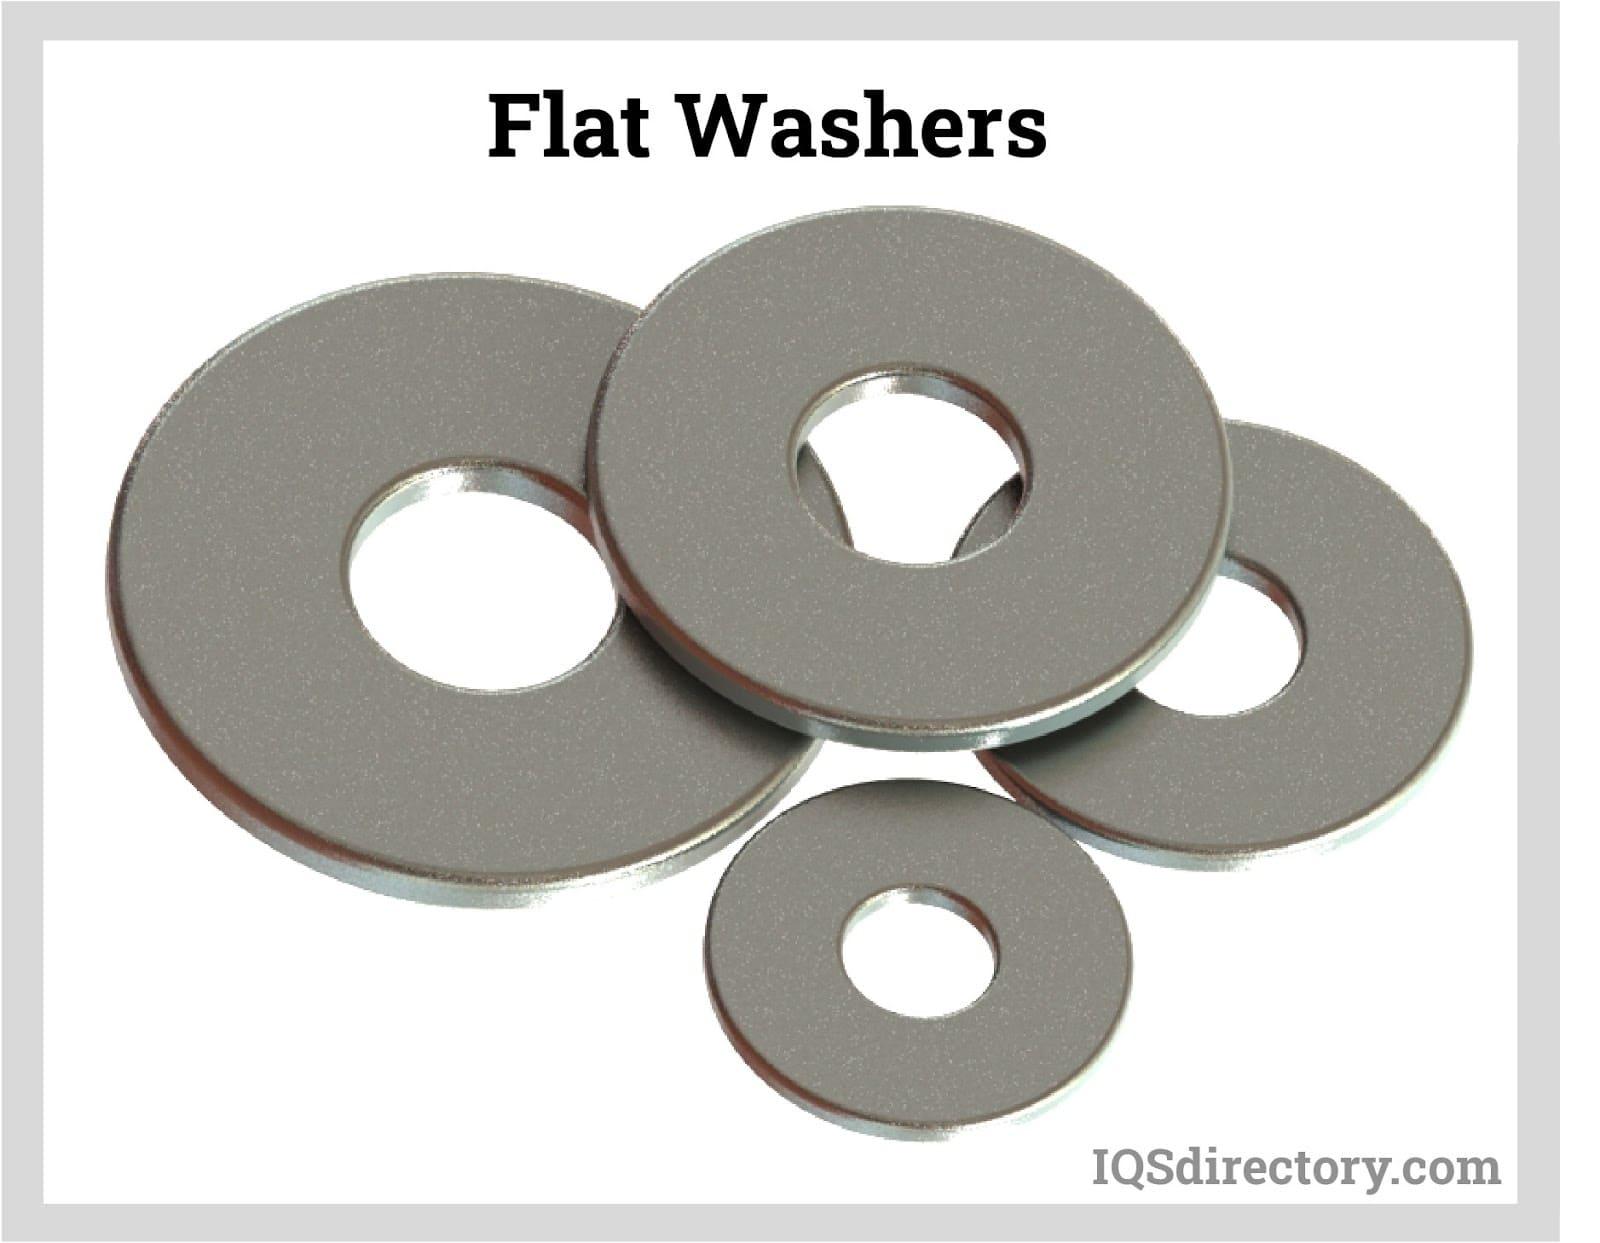 Flat Washers